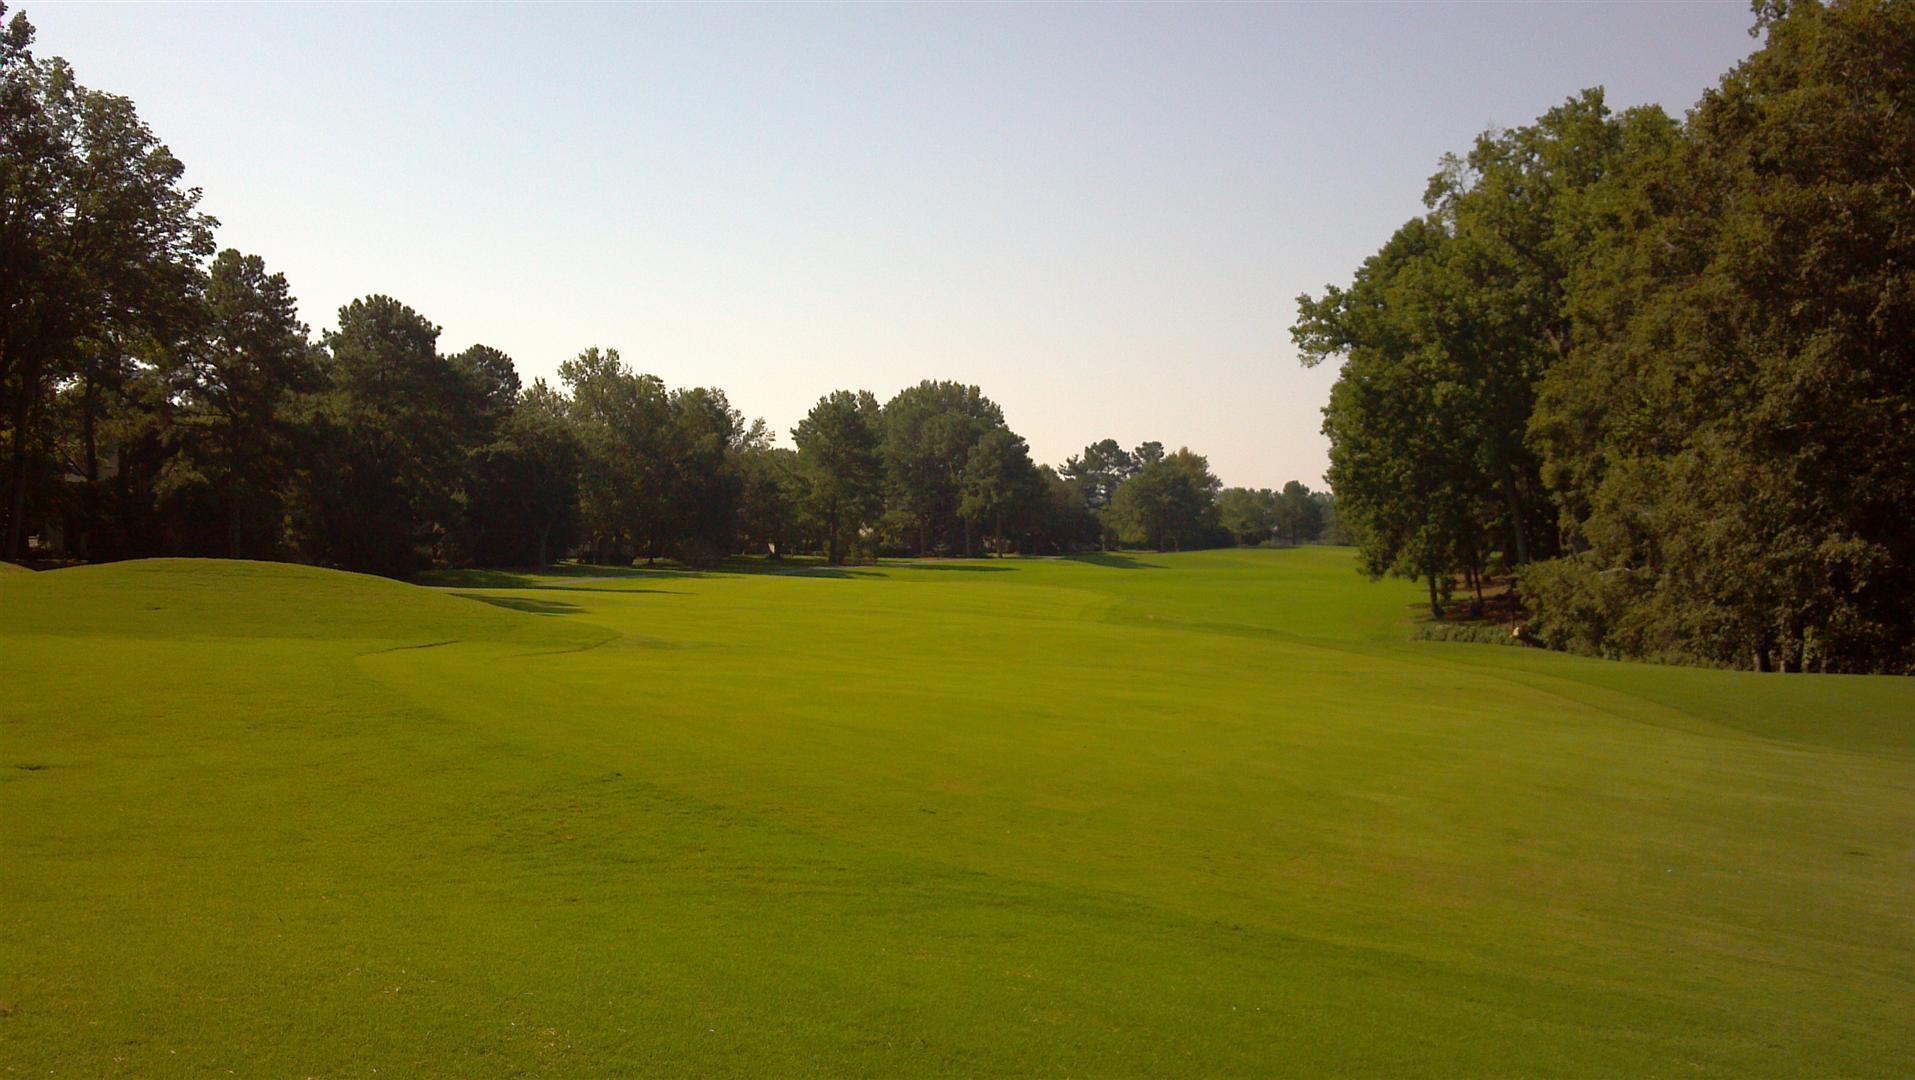 My Golf Vacation image 13